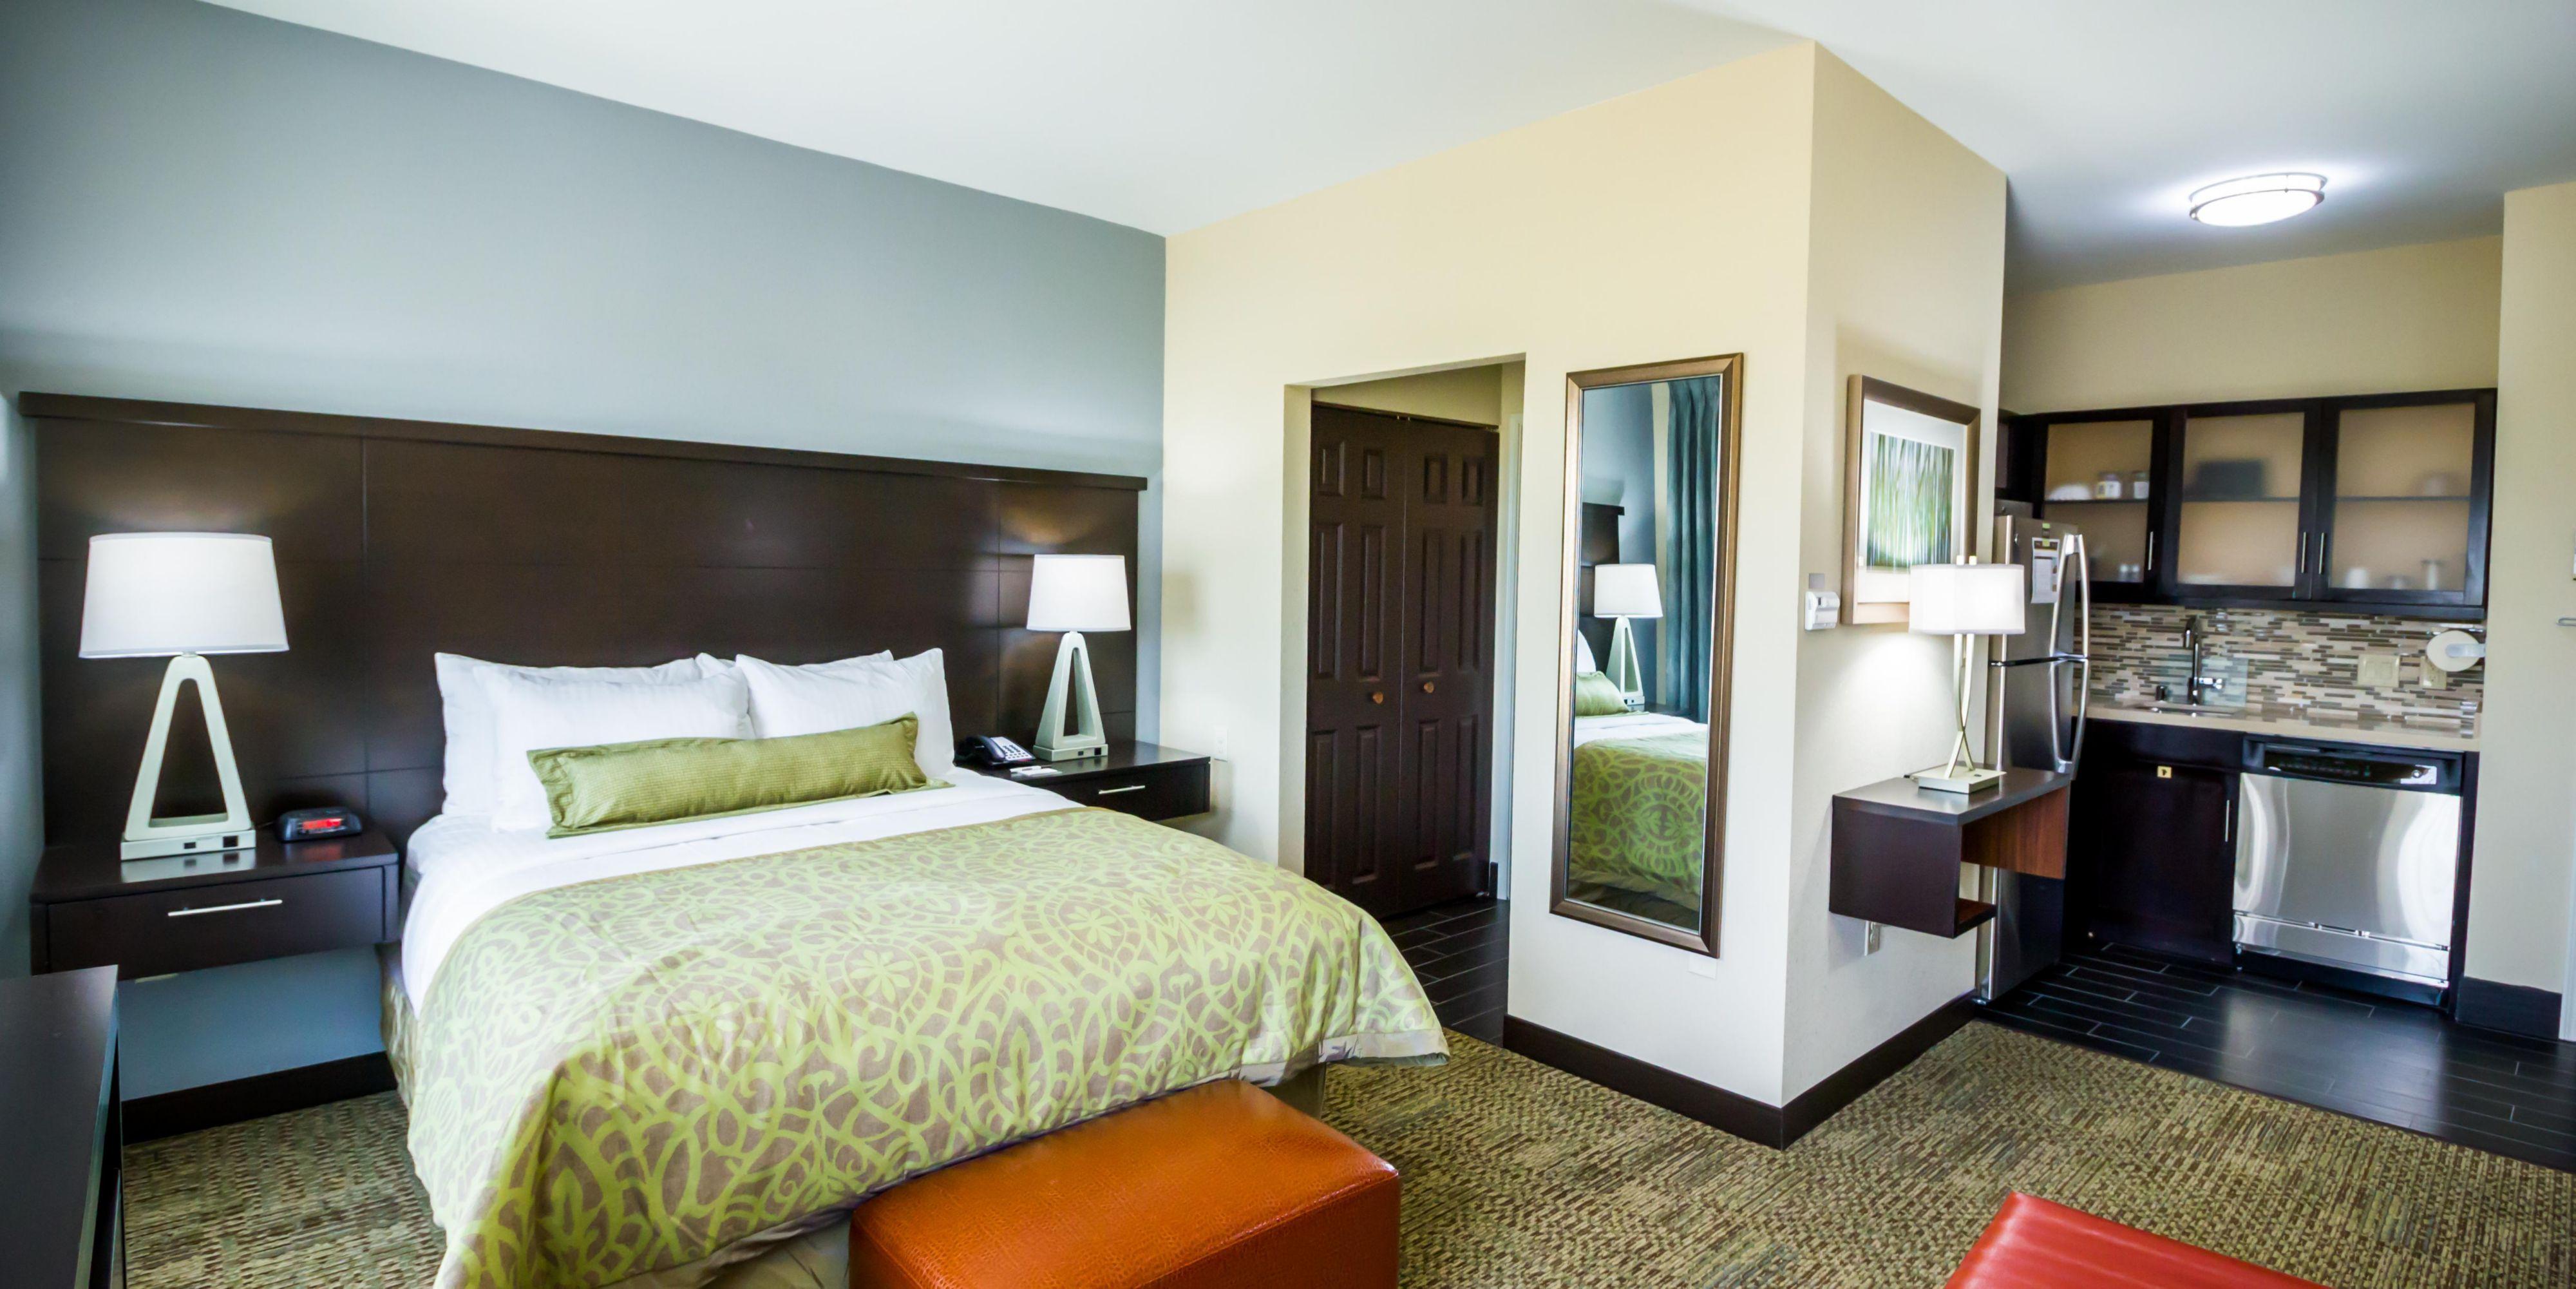 Staybridge Suites Plano Frisco image 1